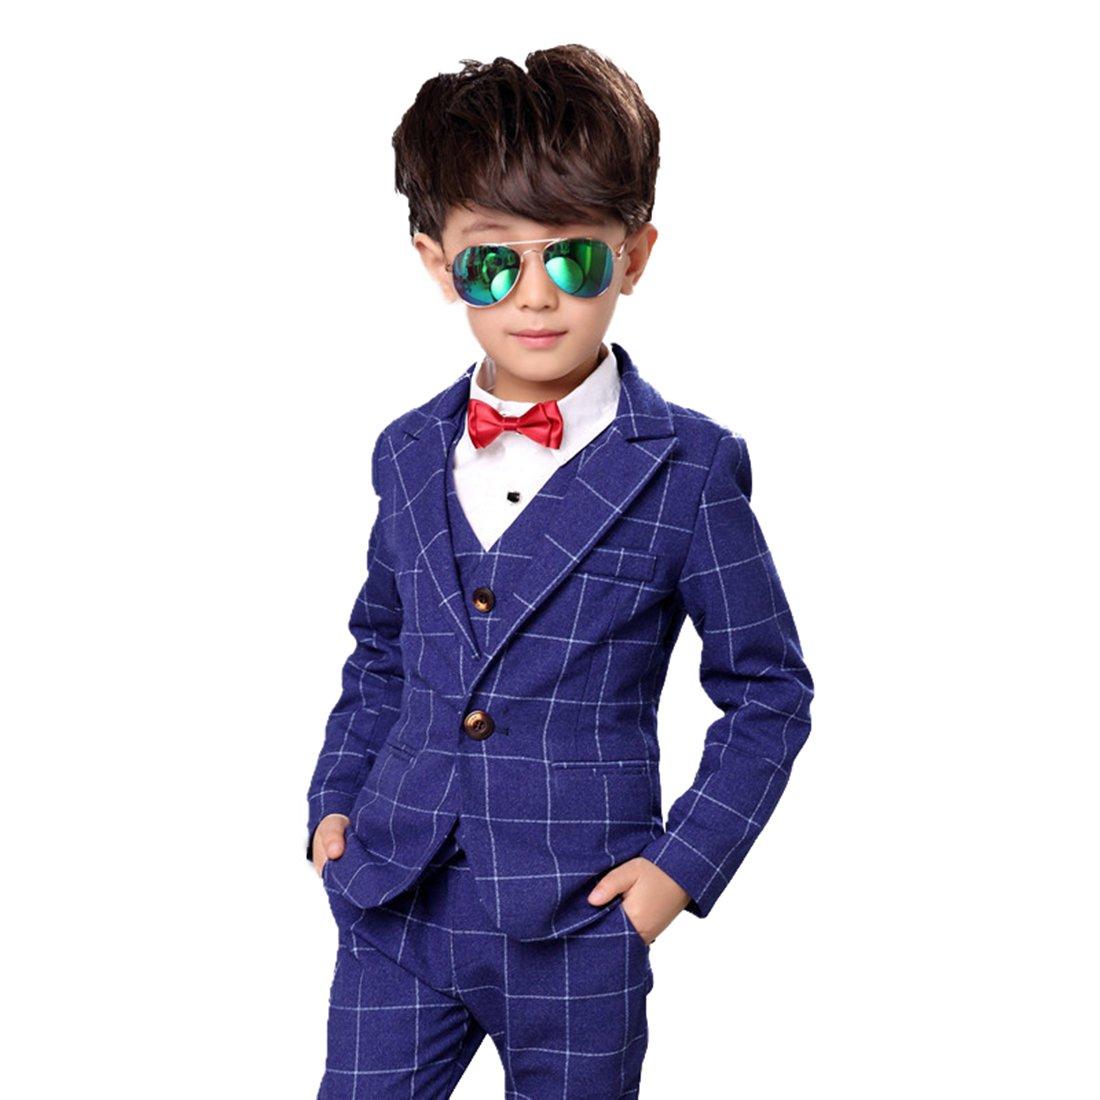 Gele Boy 4ピースフォーマルドレススーツ、ベスト+ブレザー+パンツ+蝶ネクタイ 6 ブルー B074N6R8MP